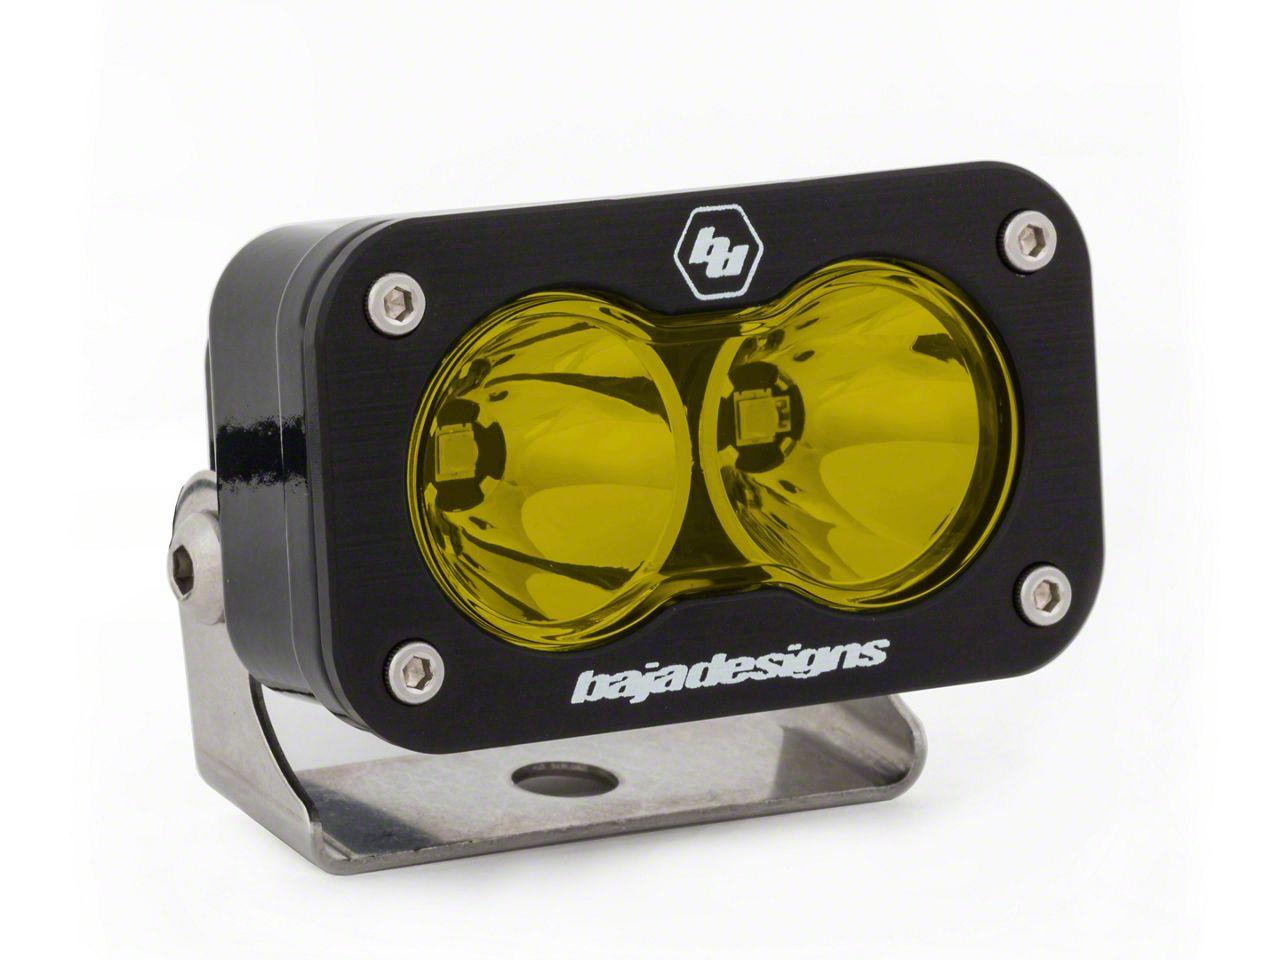 Baja Designs S2 Pro Amber LED Light - Spot Beam